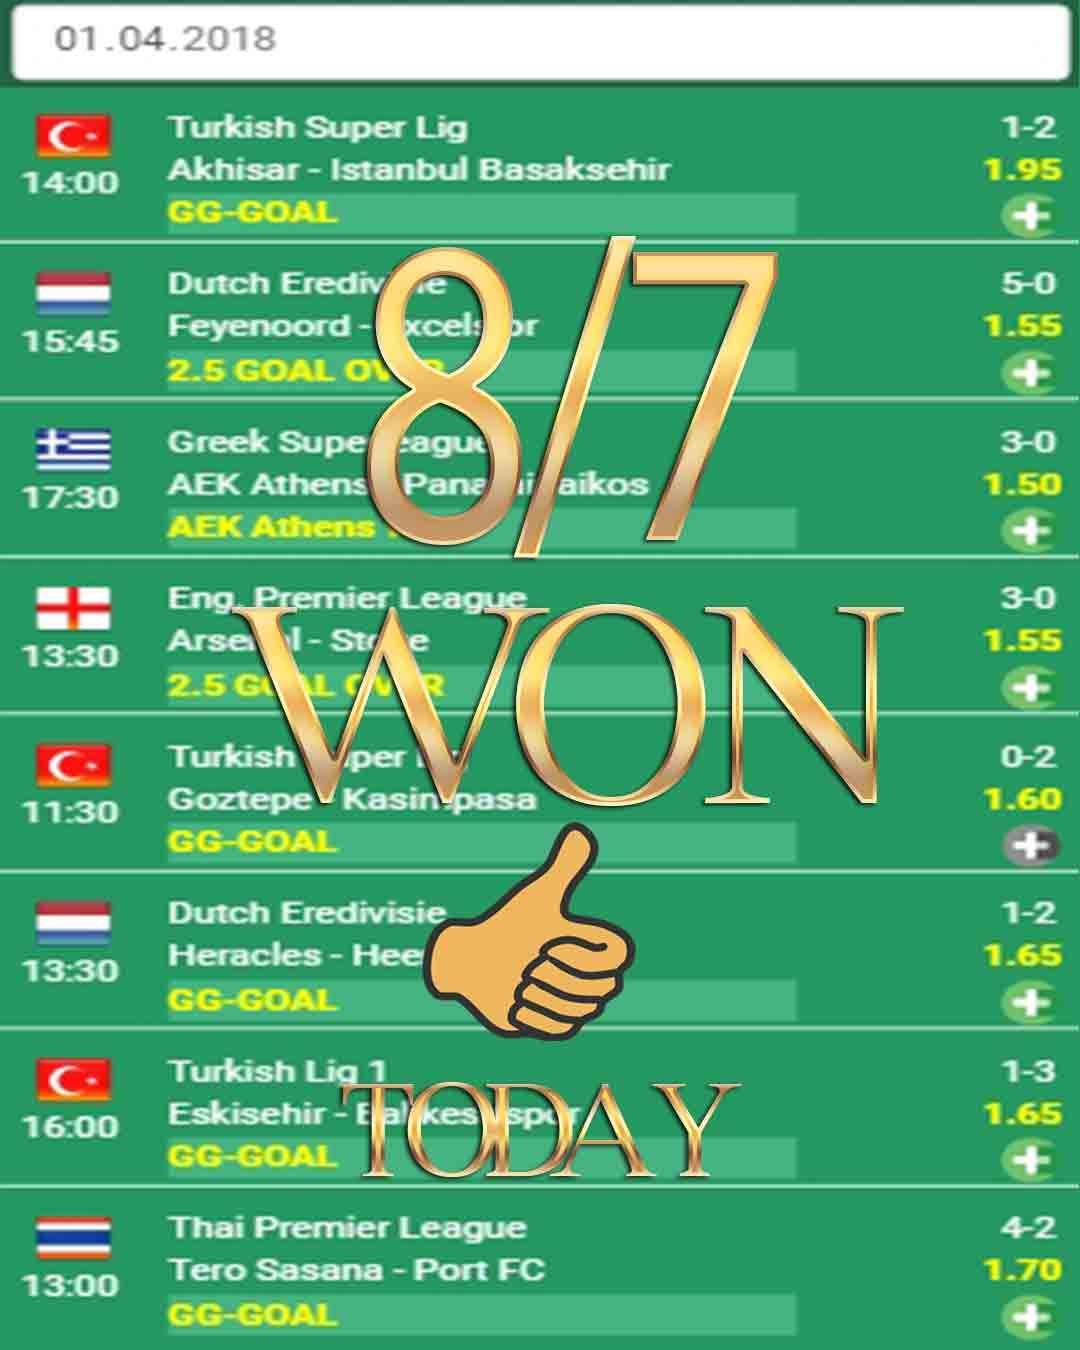 Vip betting odds 8/7 WON - Bets analysis, Betsson, Football